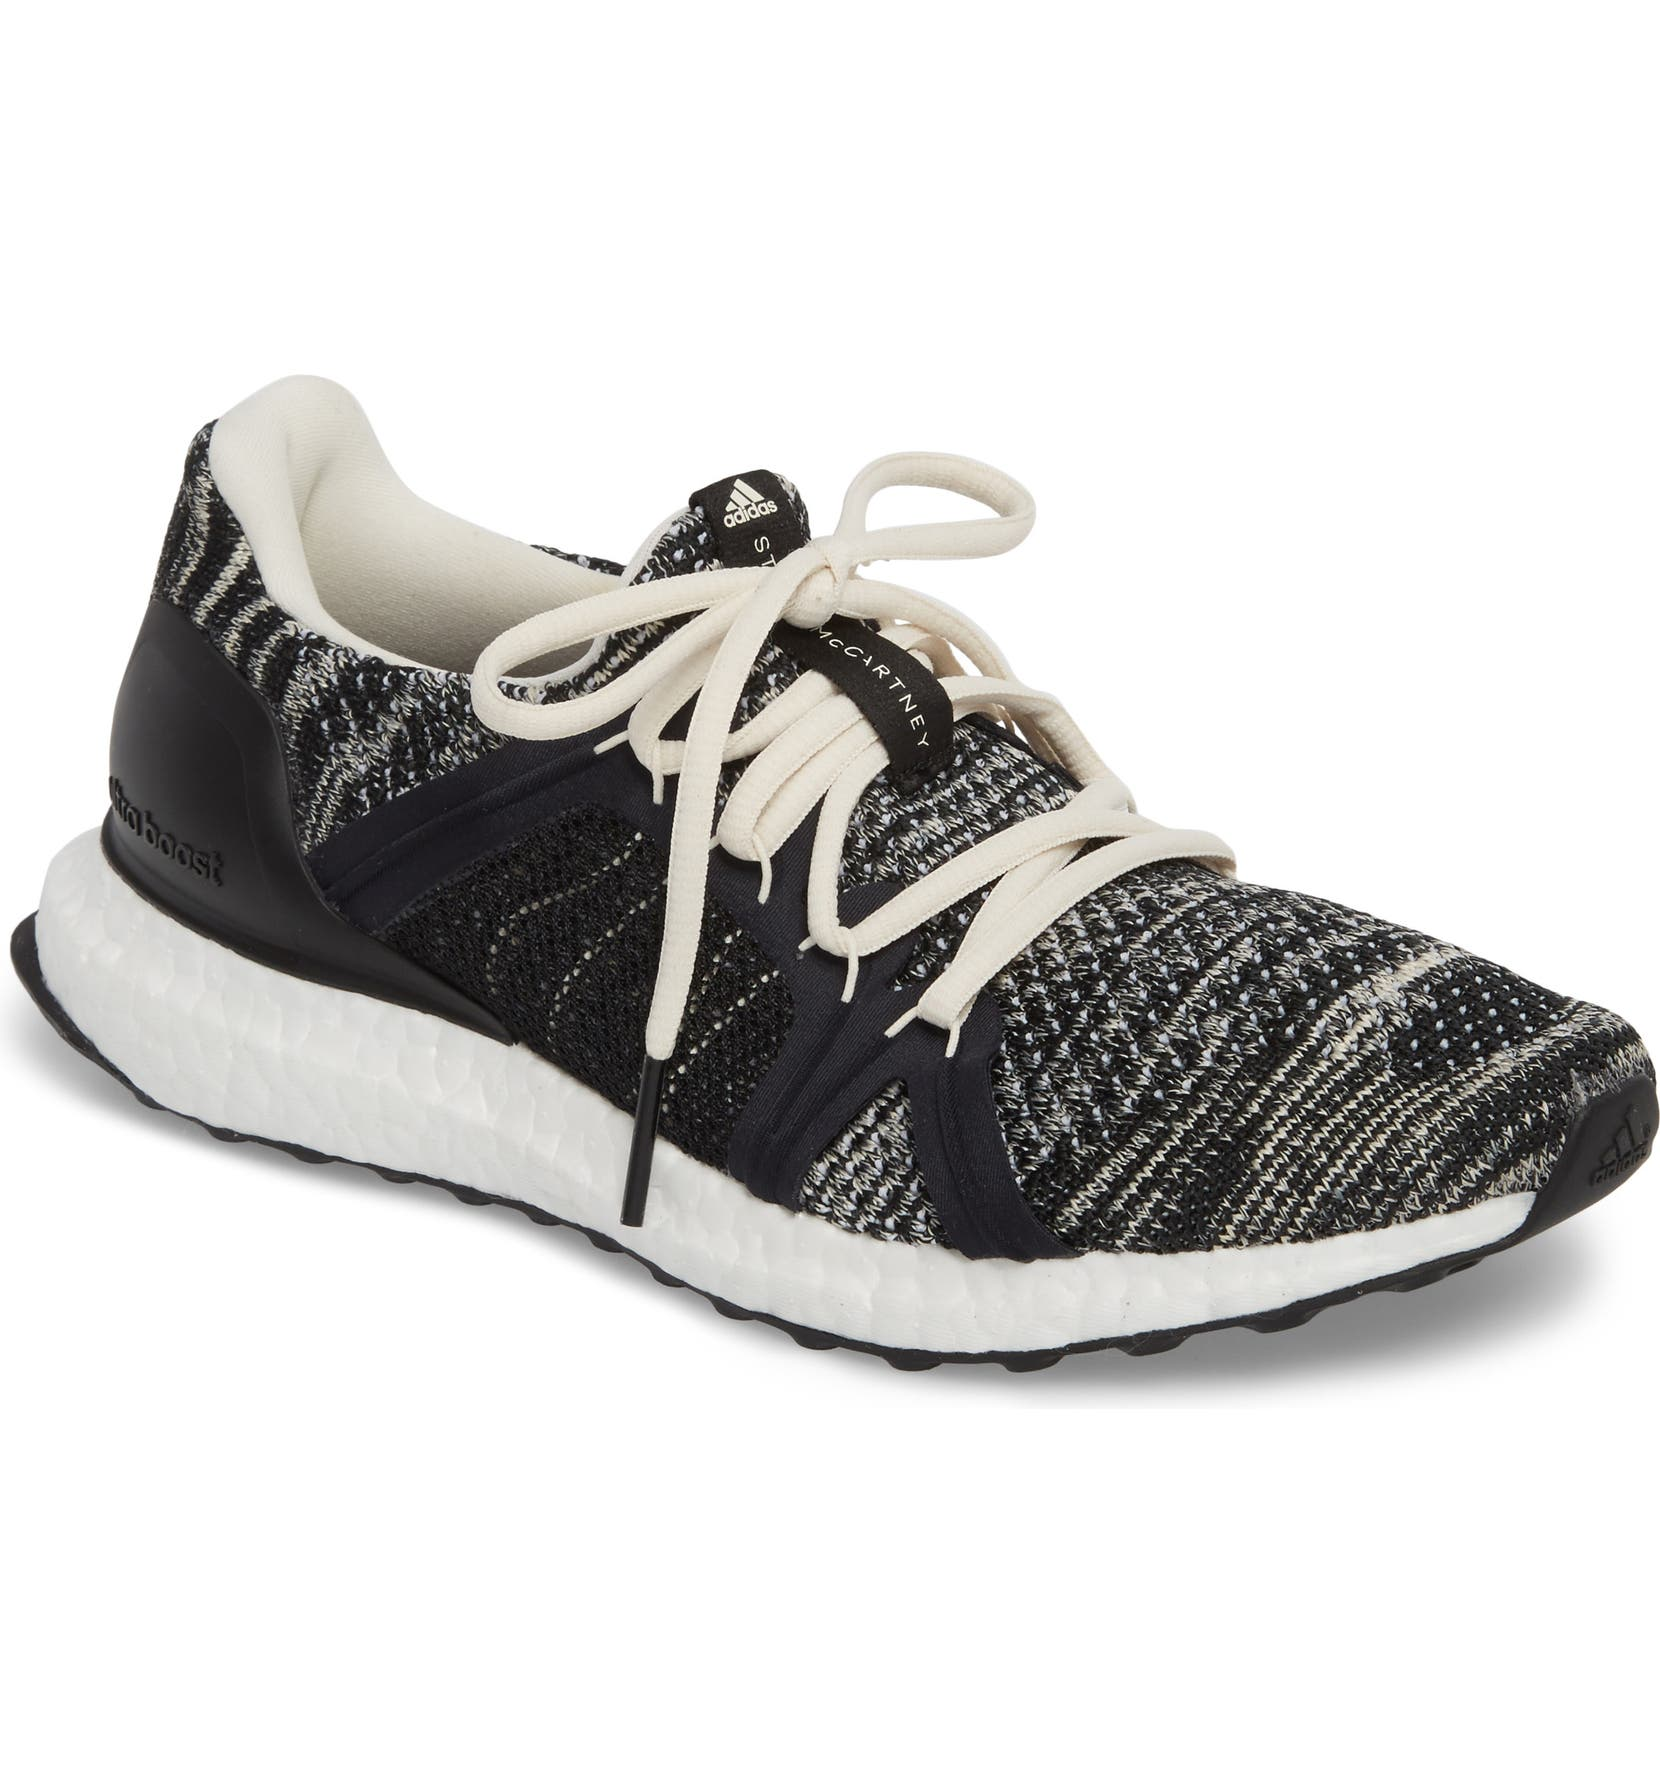 5d817bfdc88fc adidas by Stella McCartney UltraBoost x Parley Running Shoe (Women ...